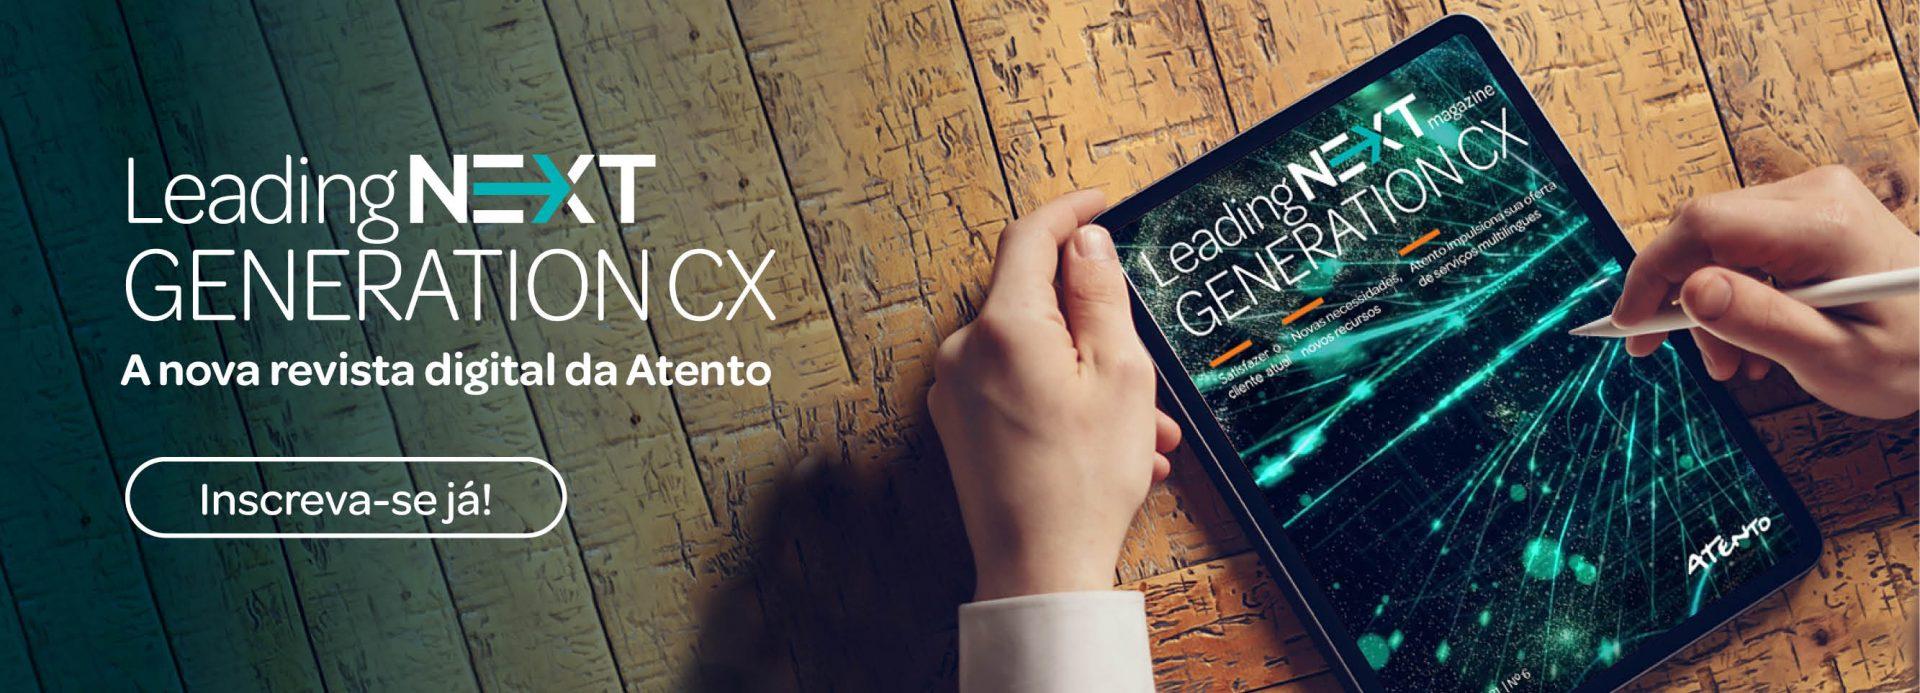 Atento Next Generation CX 6